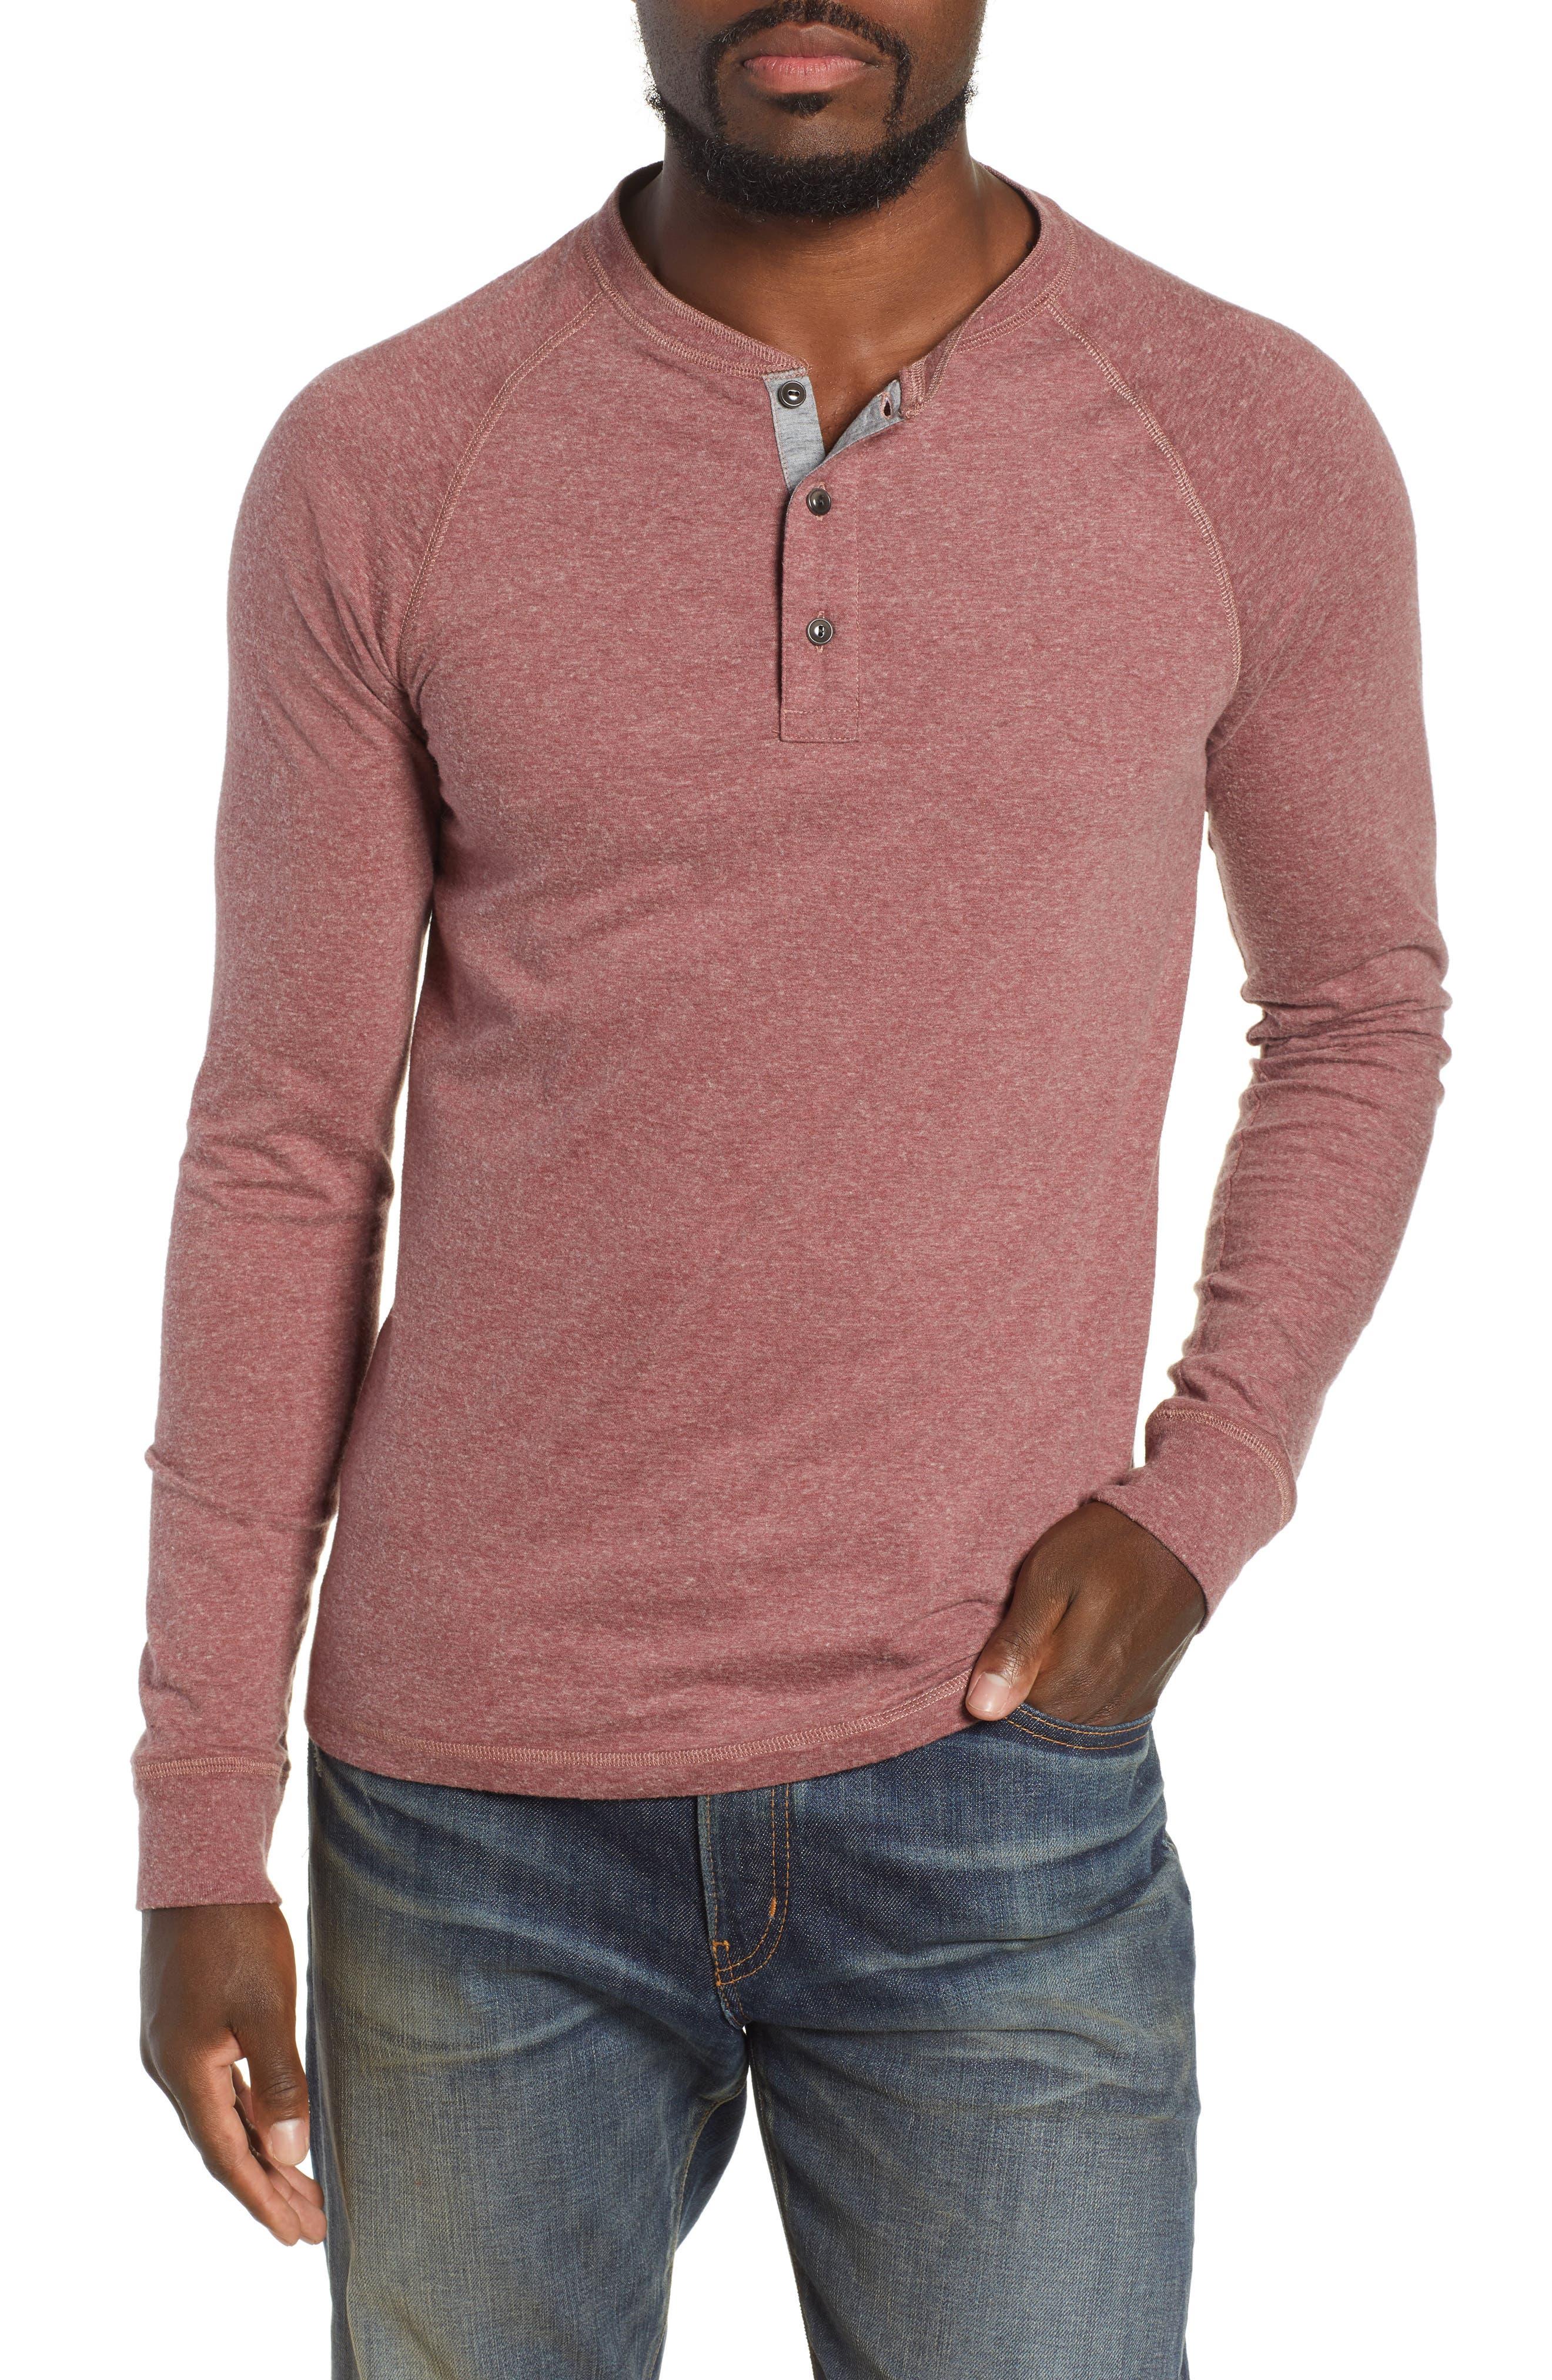 FAHERTY Men'S Luxe Heather Organic Slub Henley Shirt in Burgundy